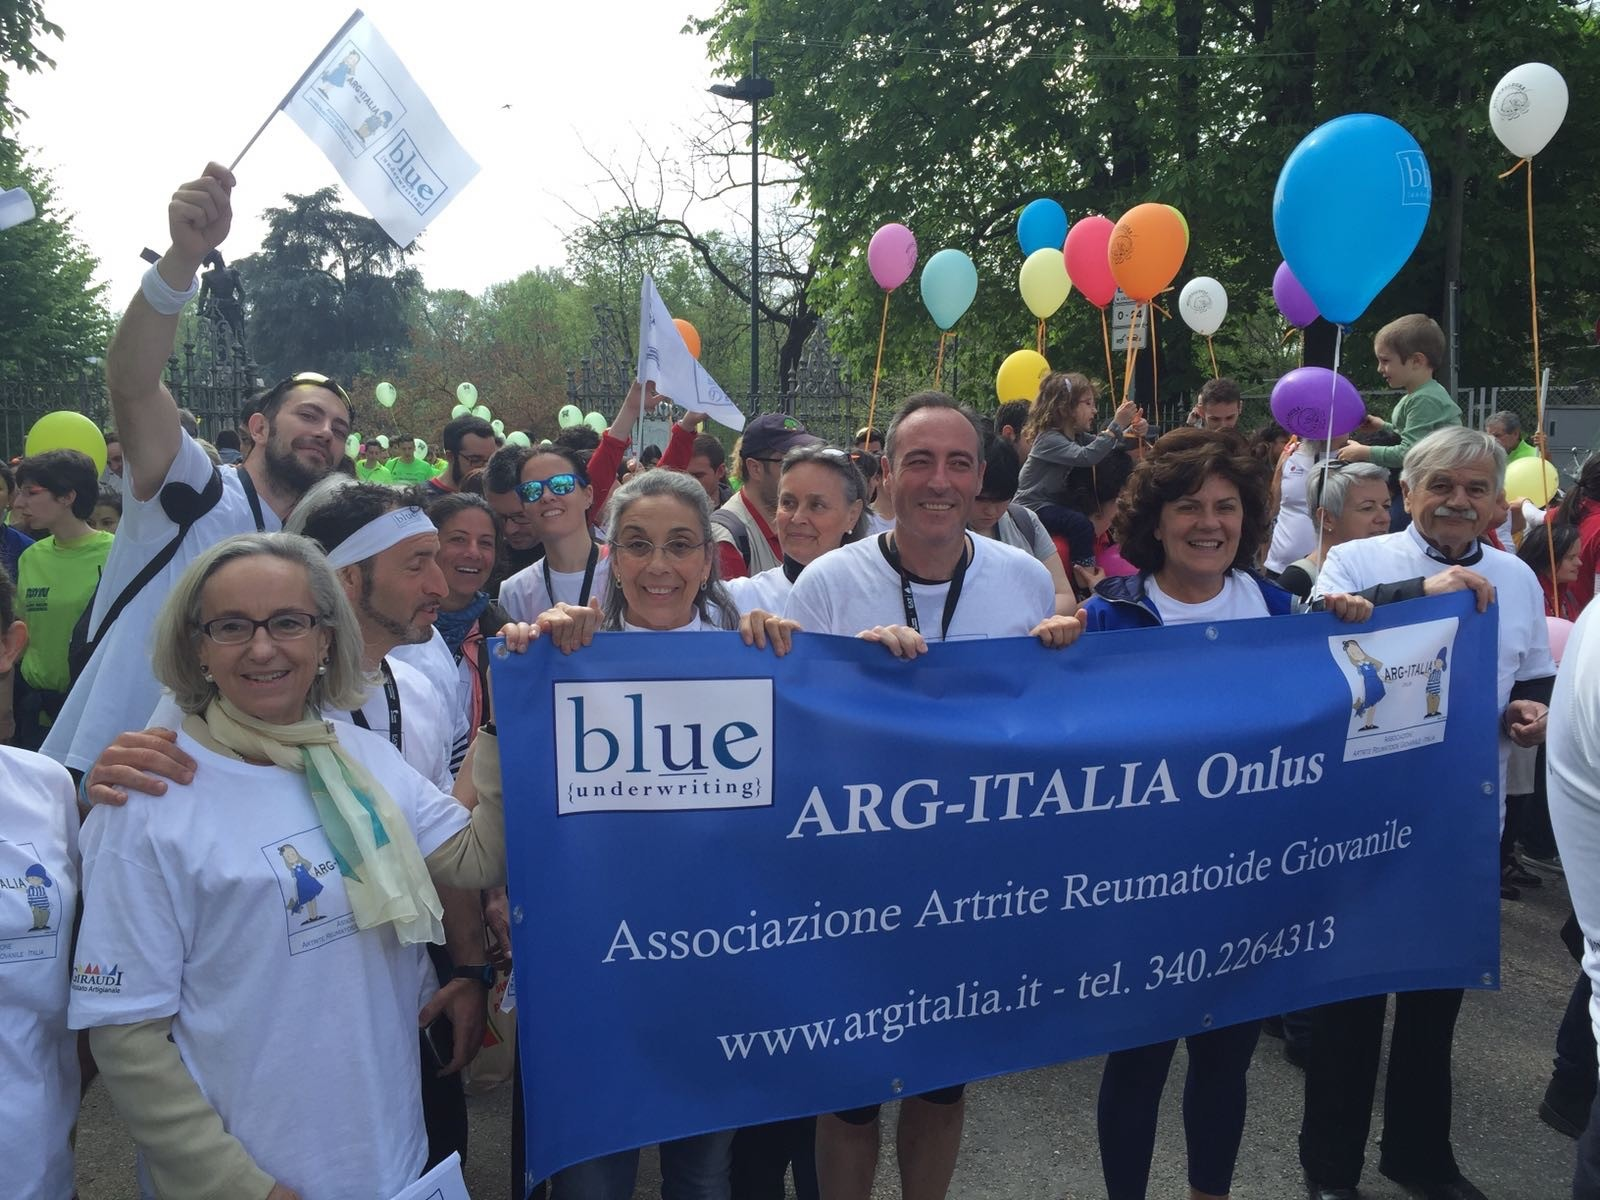 PROGETTO UVEITE: CORRI con NOI-ARG-ITALIA Onlus